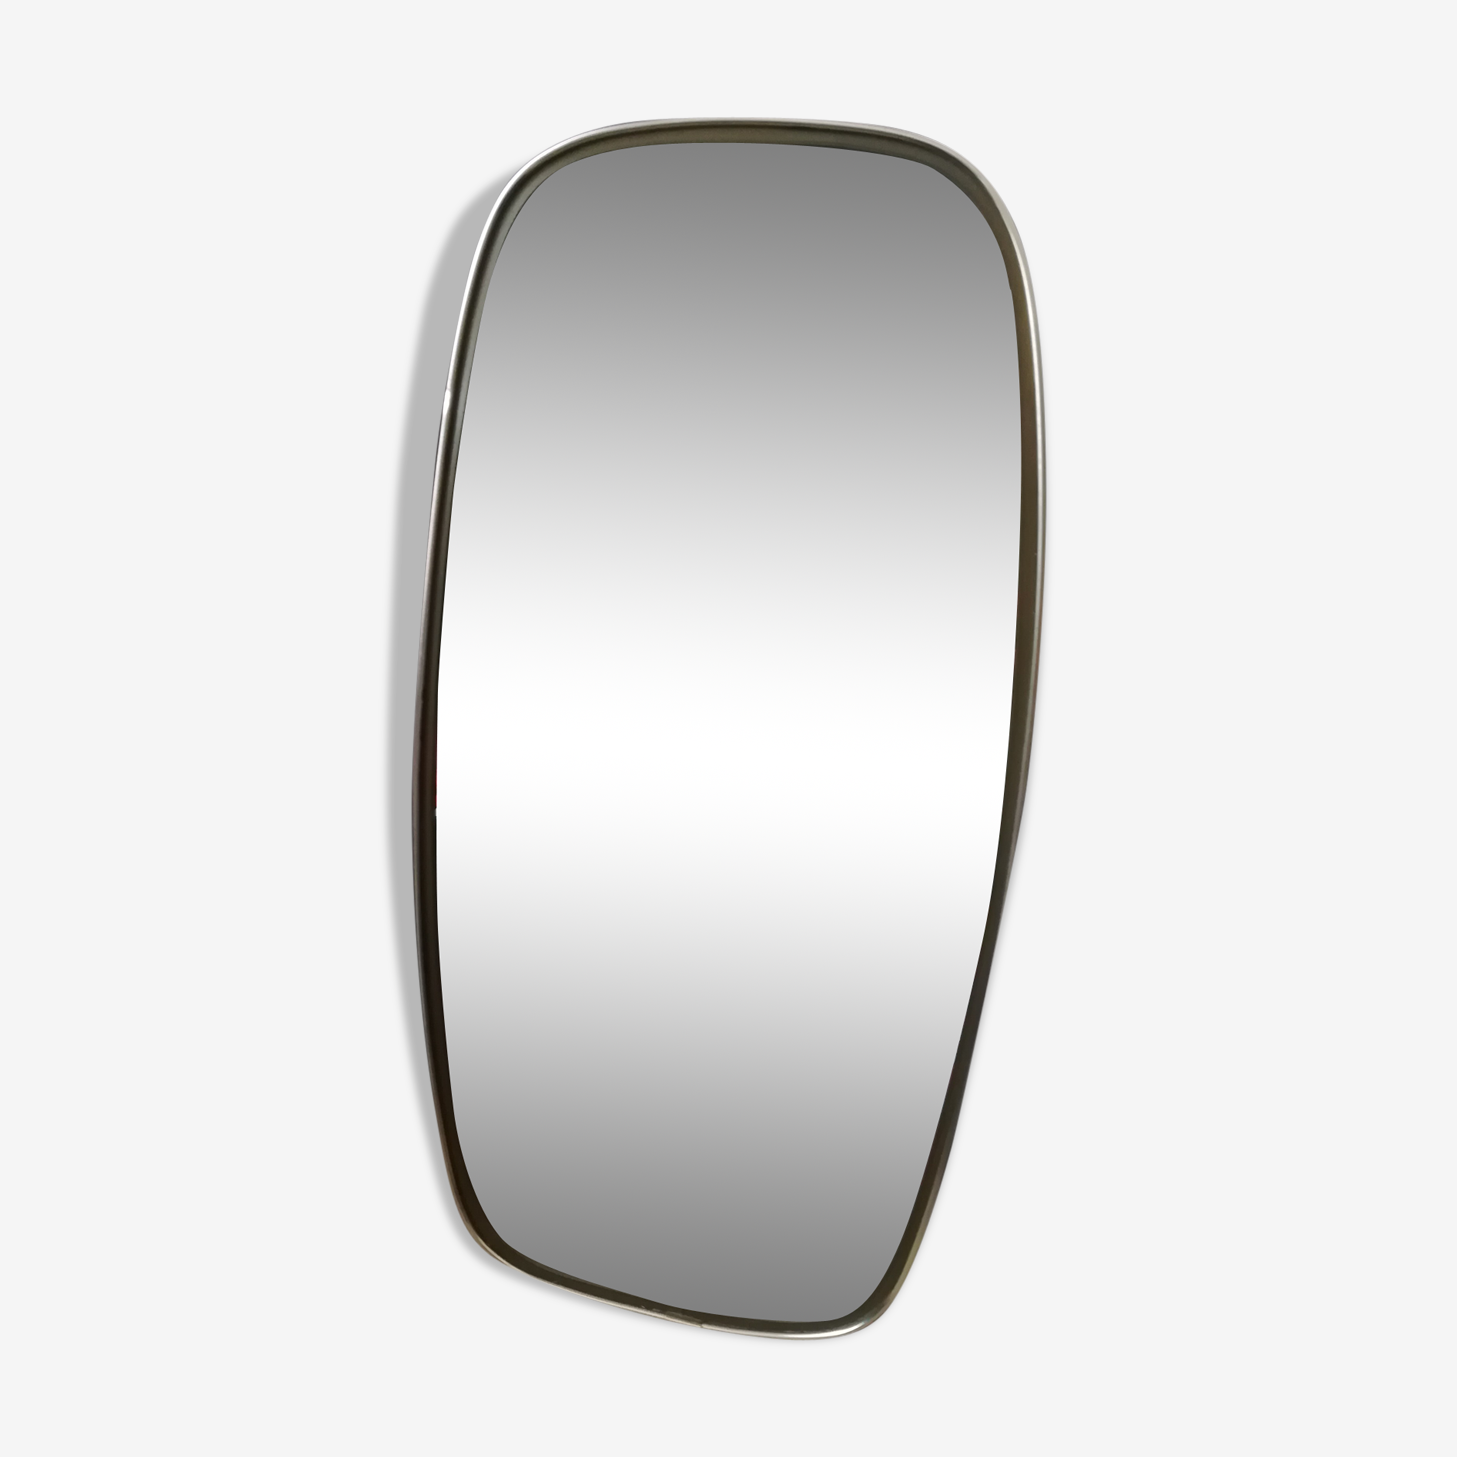 Asymmetric mirror shape free vintage brass 23x47cm